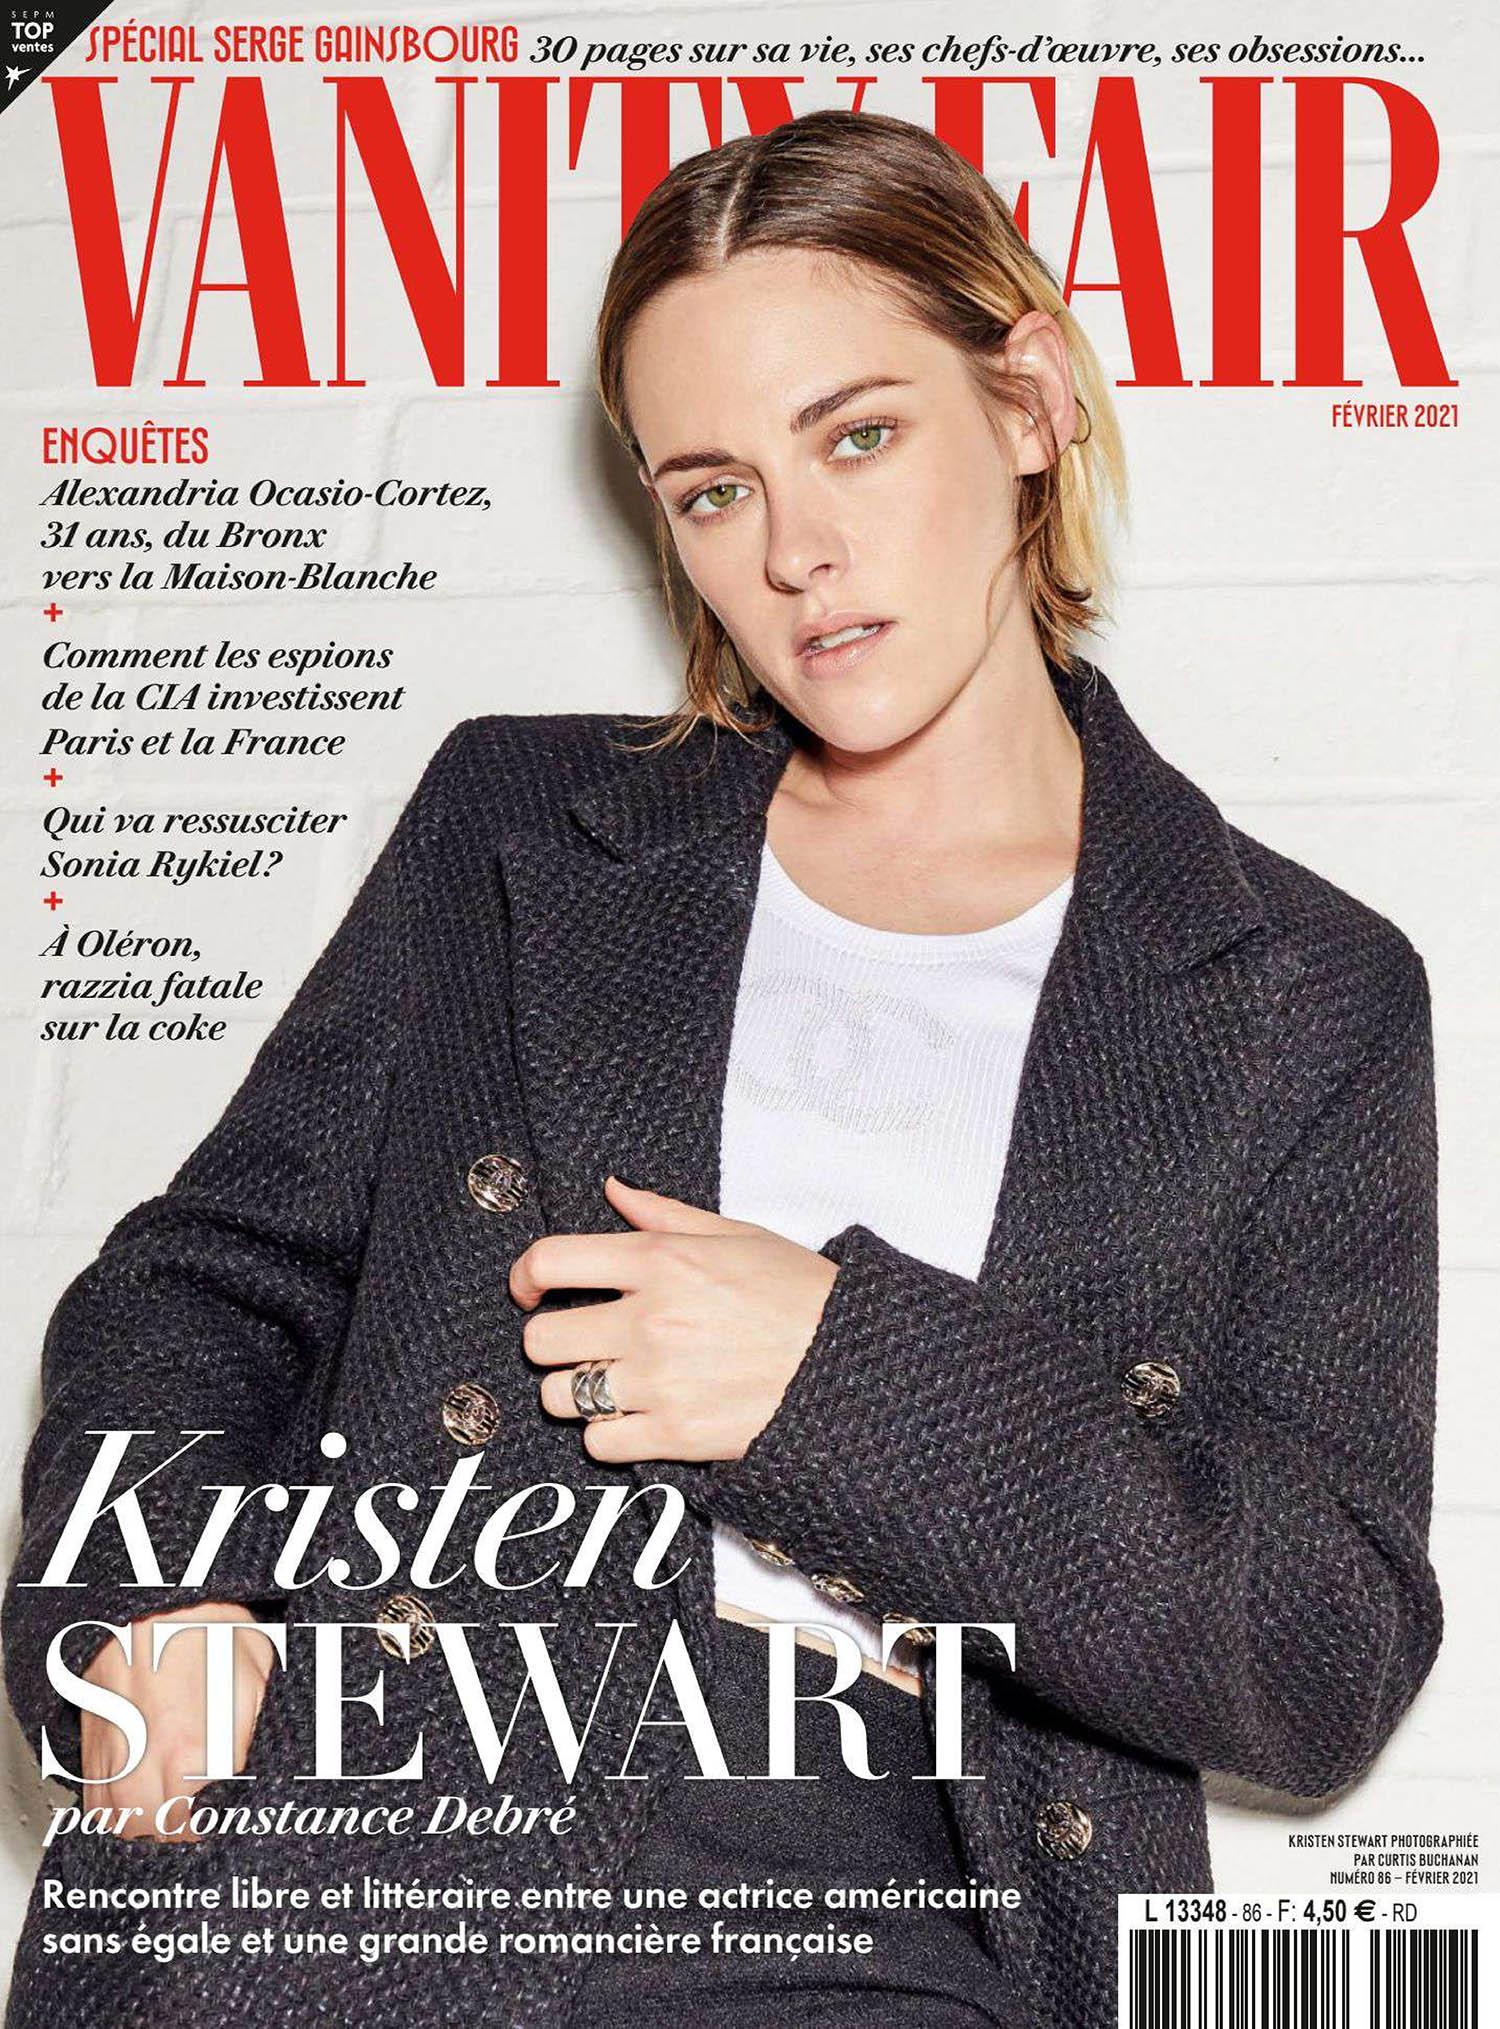 Kristen Stewart covers Vanity Fair France February 2021 by Curtis Buchanan